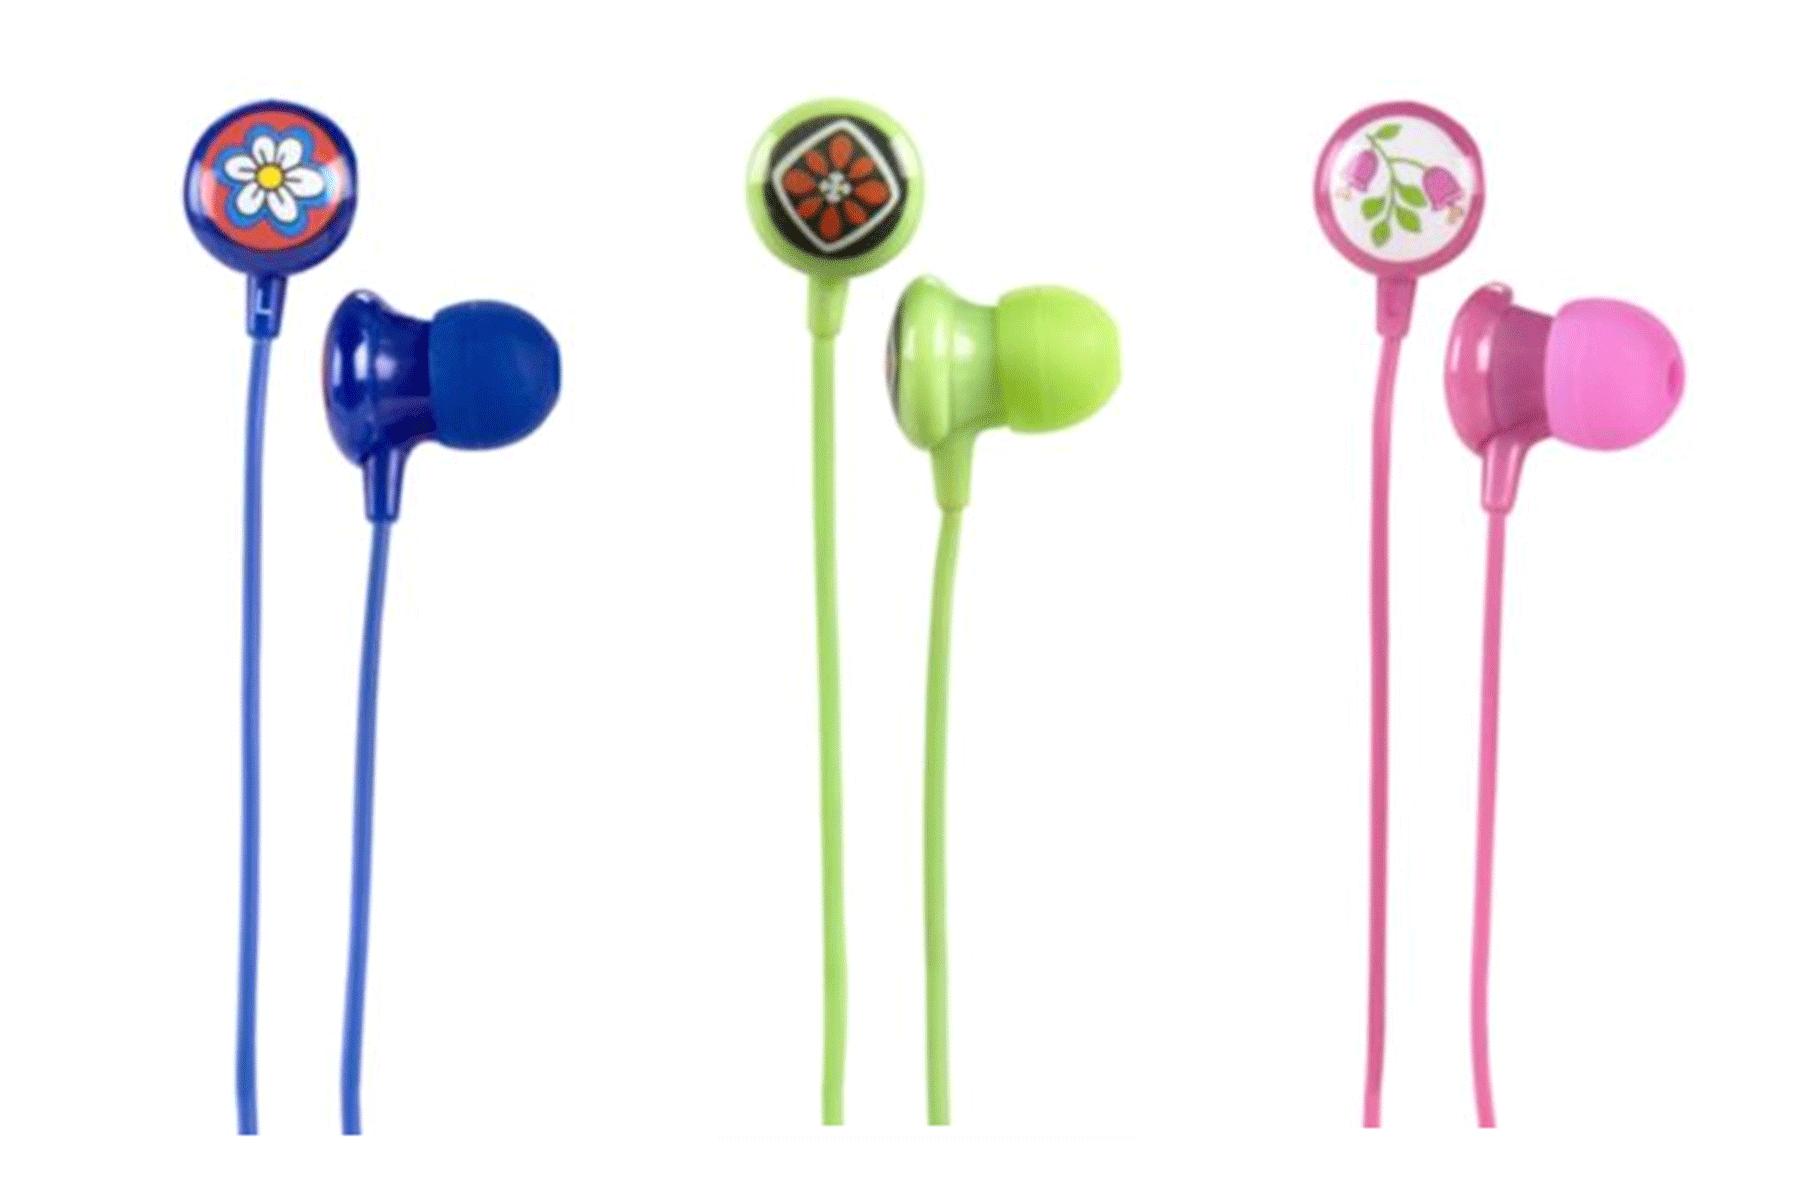 kristen-poissant-vera-bradley-designer-product-development-ear-buds-tech-product.png